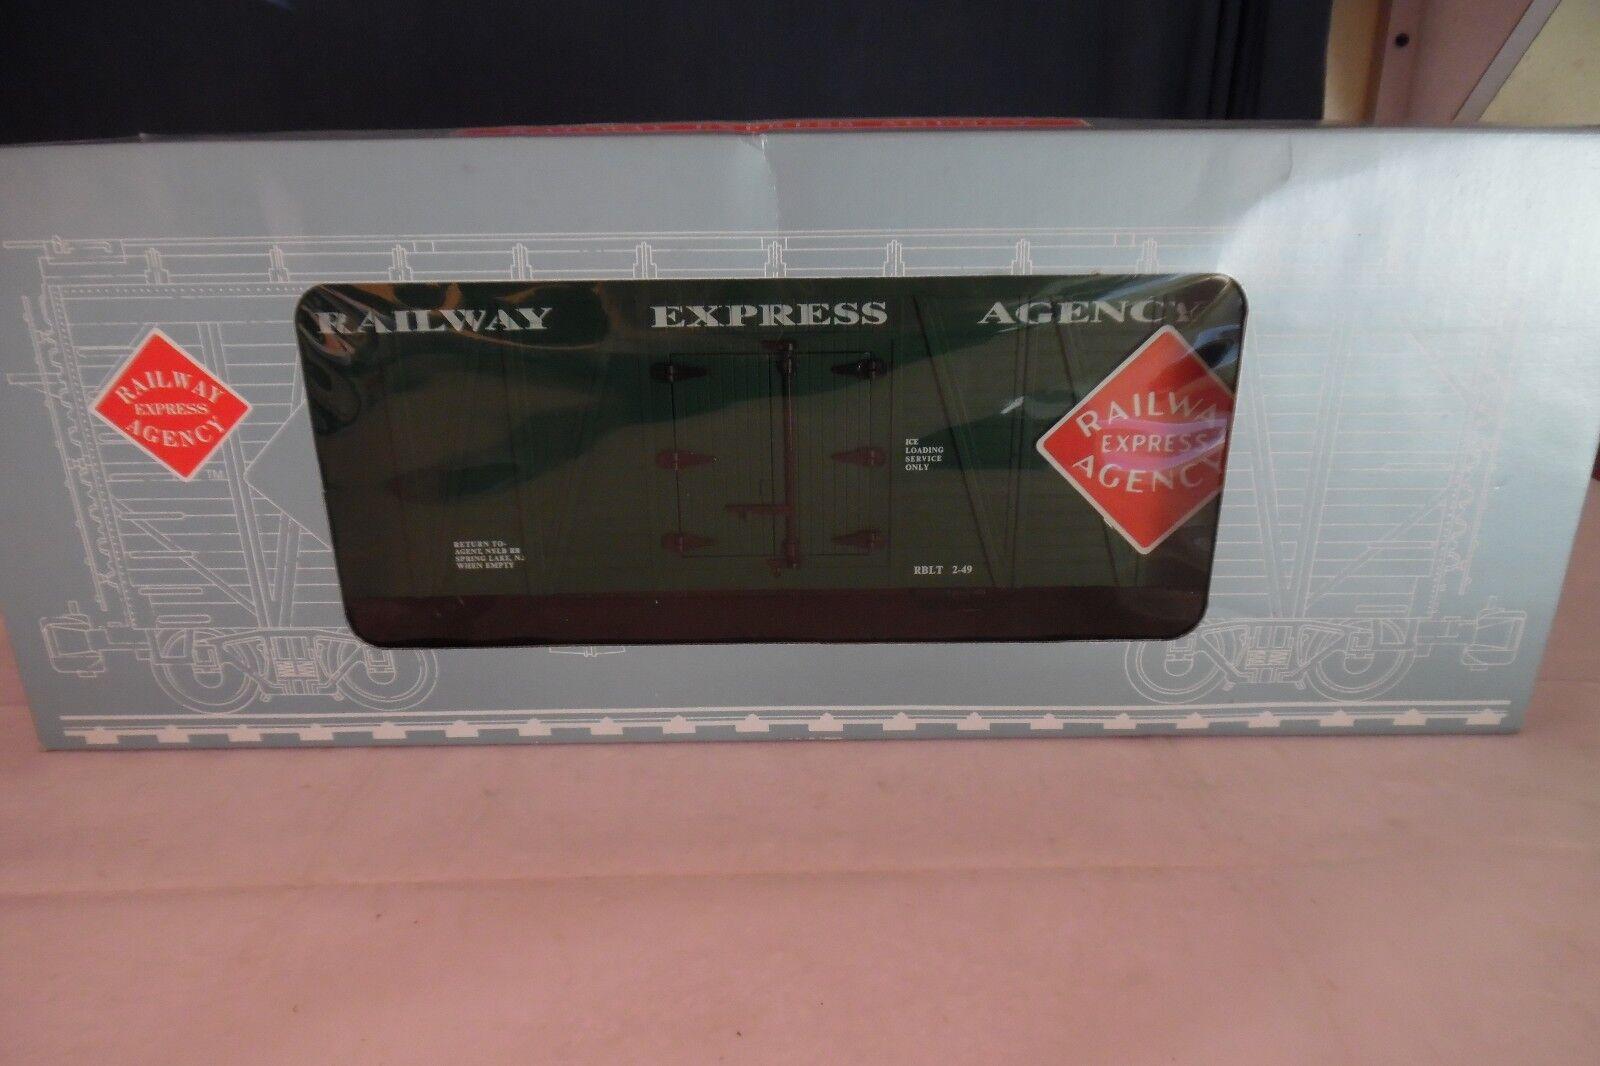 Aristo-Craft REA 46601, RAILWAY EXPRESS AGENCY TRUSS REEFER CAR, G Scale